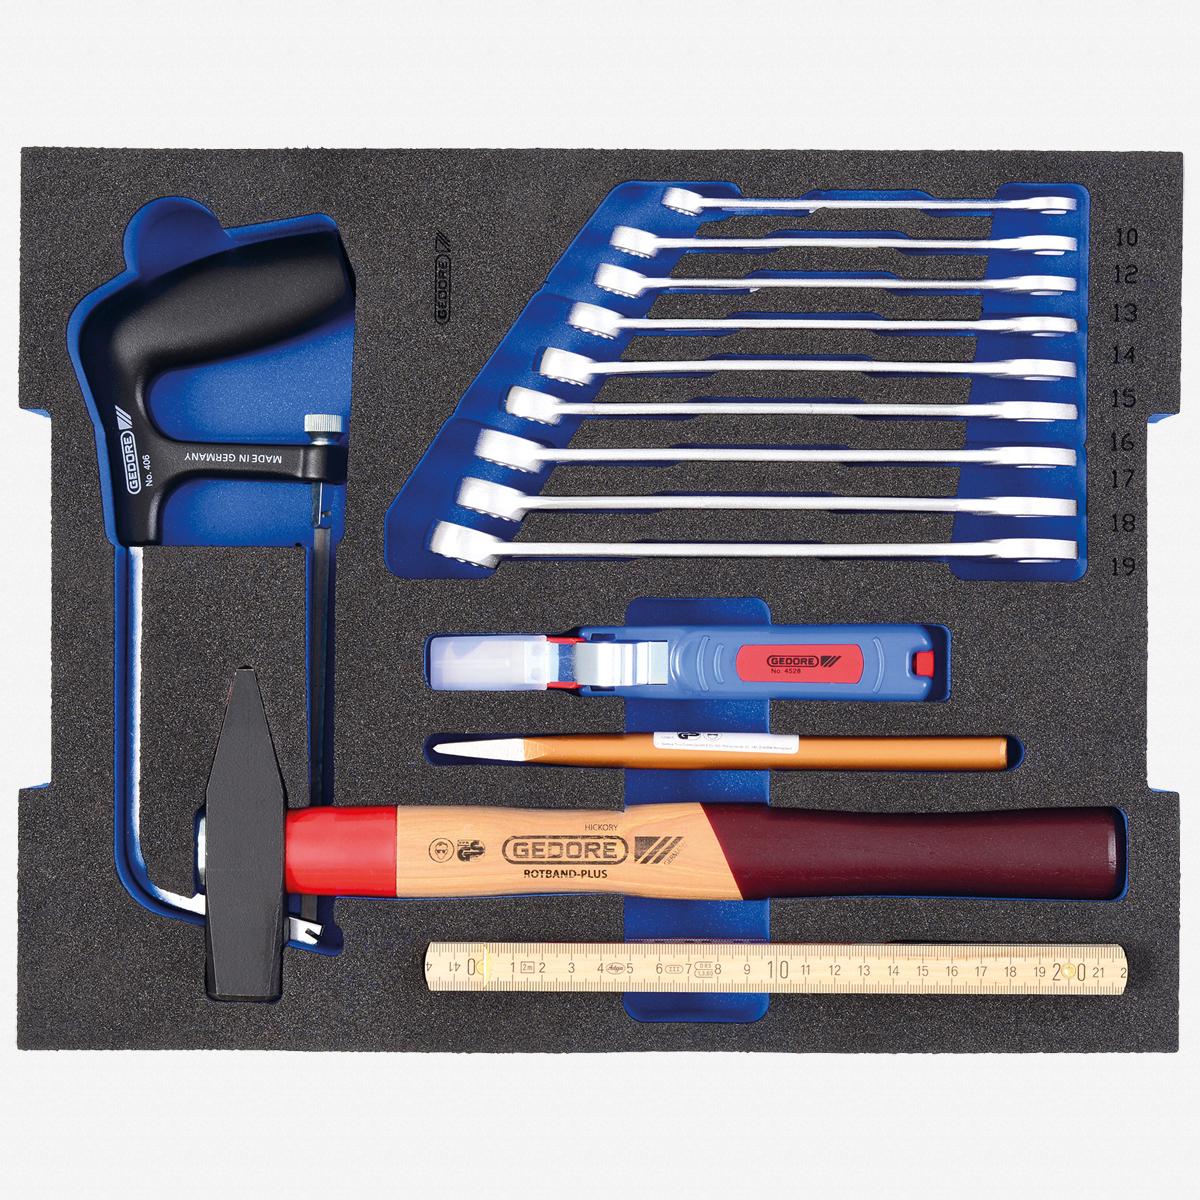 Gedore 1100 CT2-BASIC Tool assortment STARTER in 2/2 L-BOXX 136 Module - KC Tool